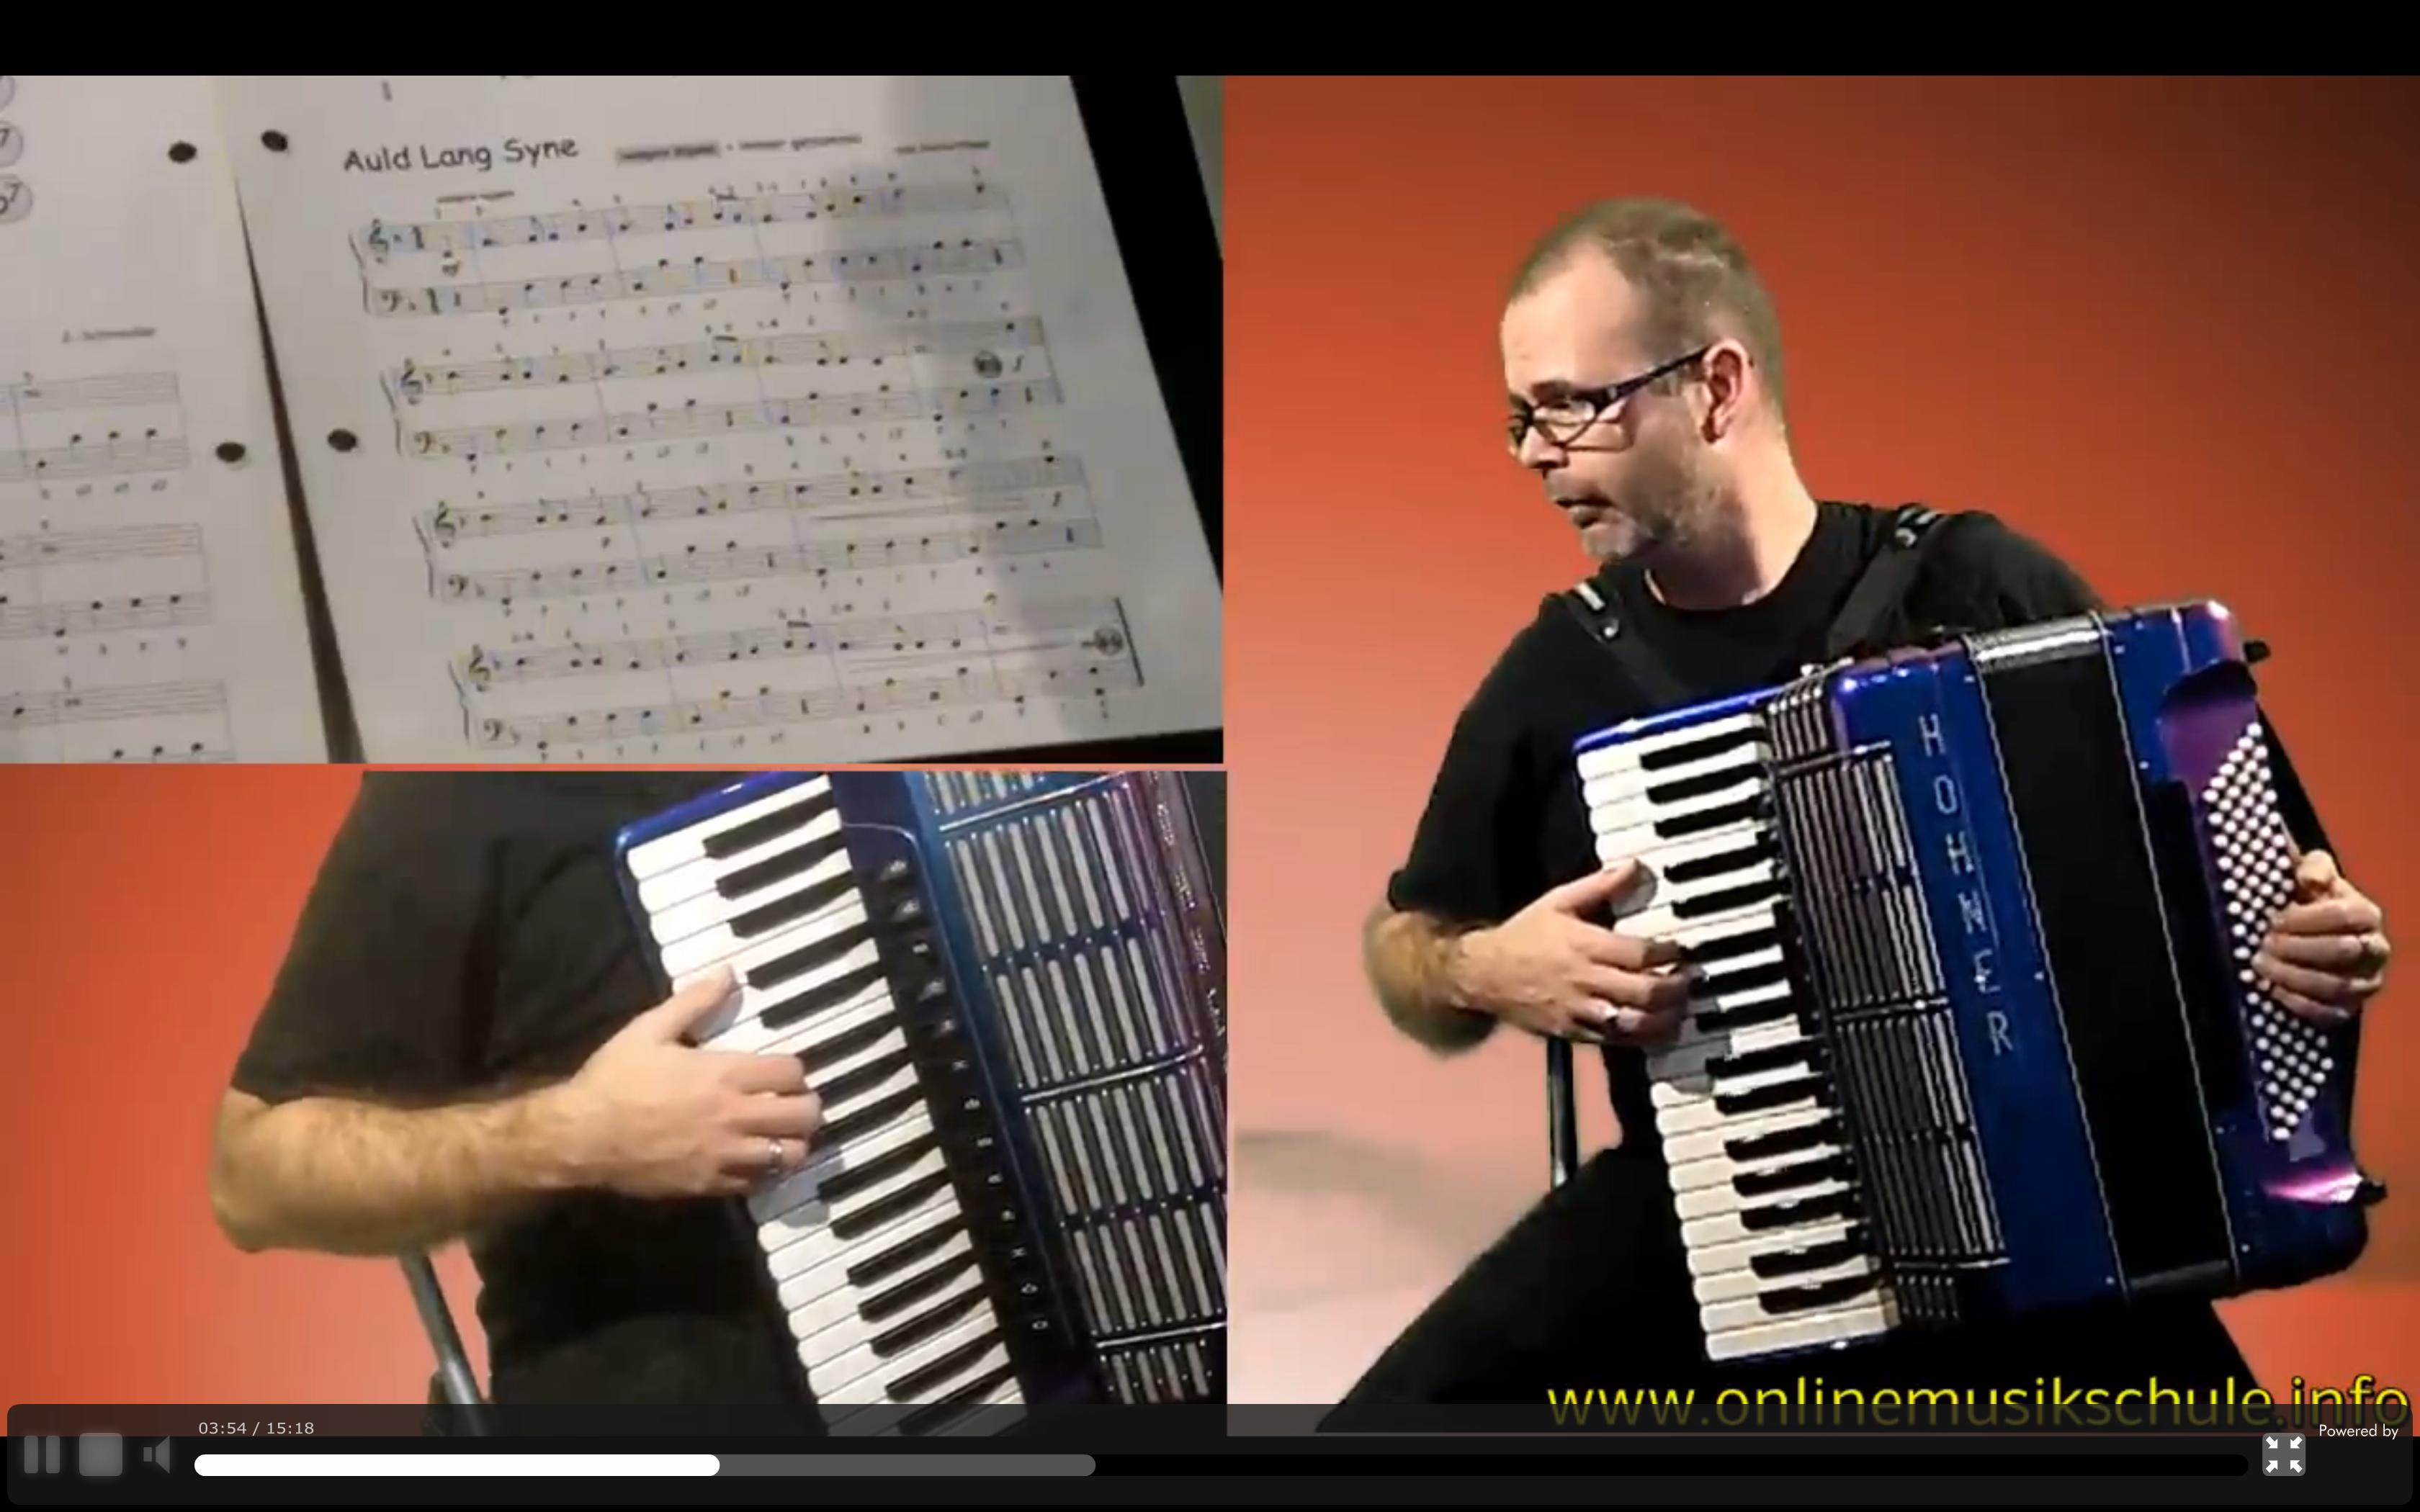 akkordeon lernen onlinemusikschule kurs 5